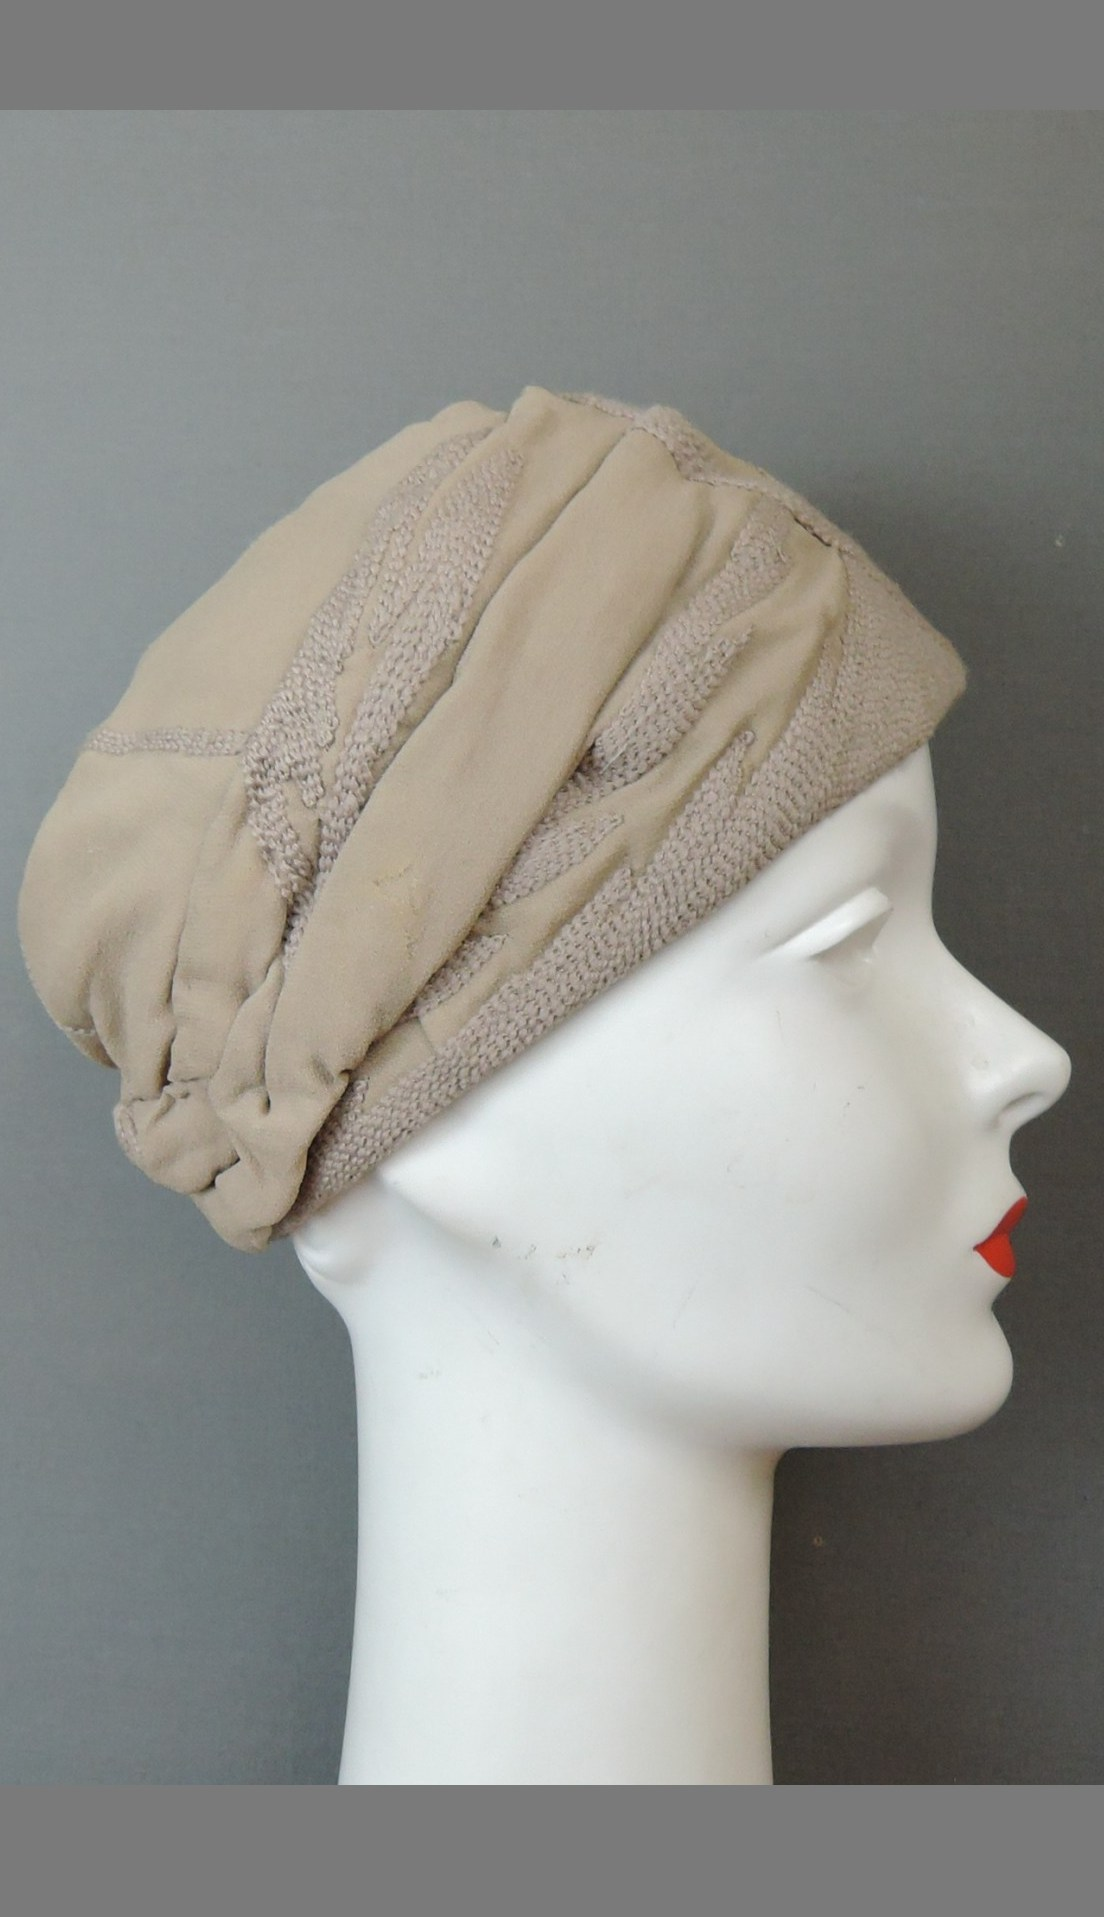 Vintage 1920s Hat Beige Silk Crepe by John Trinner, Embroidered